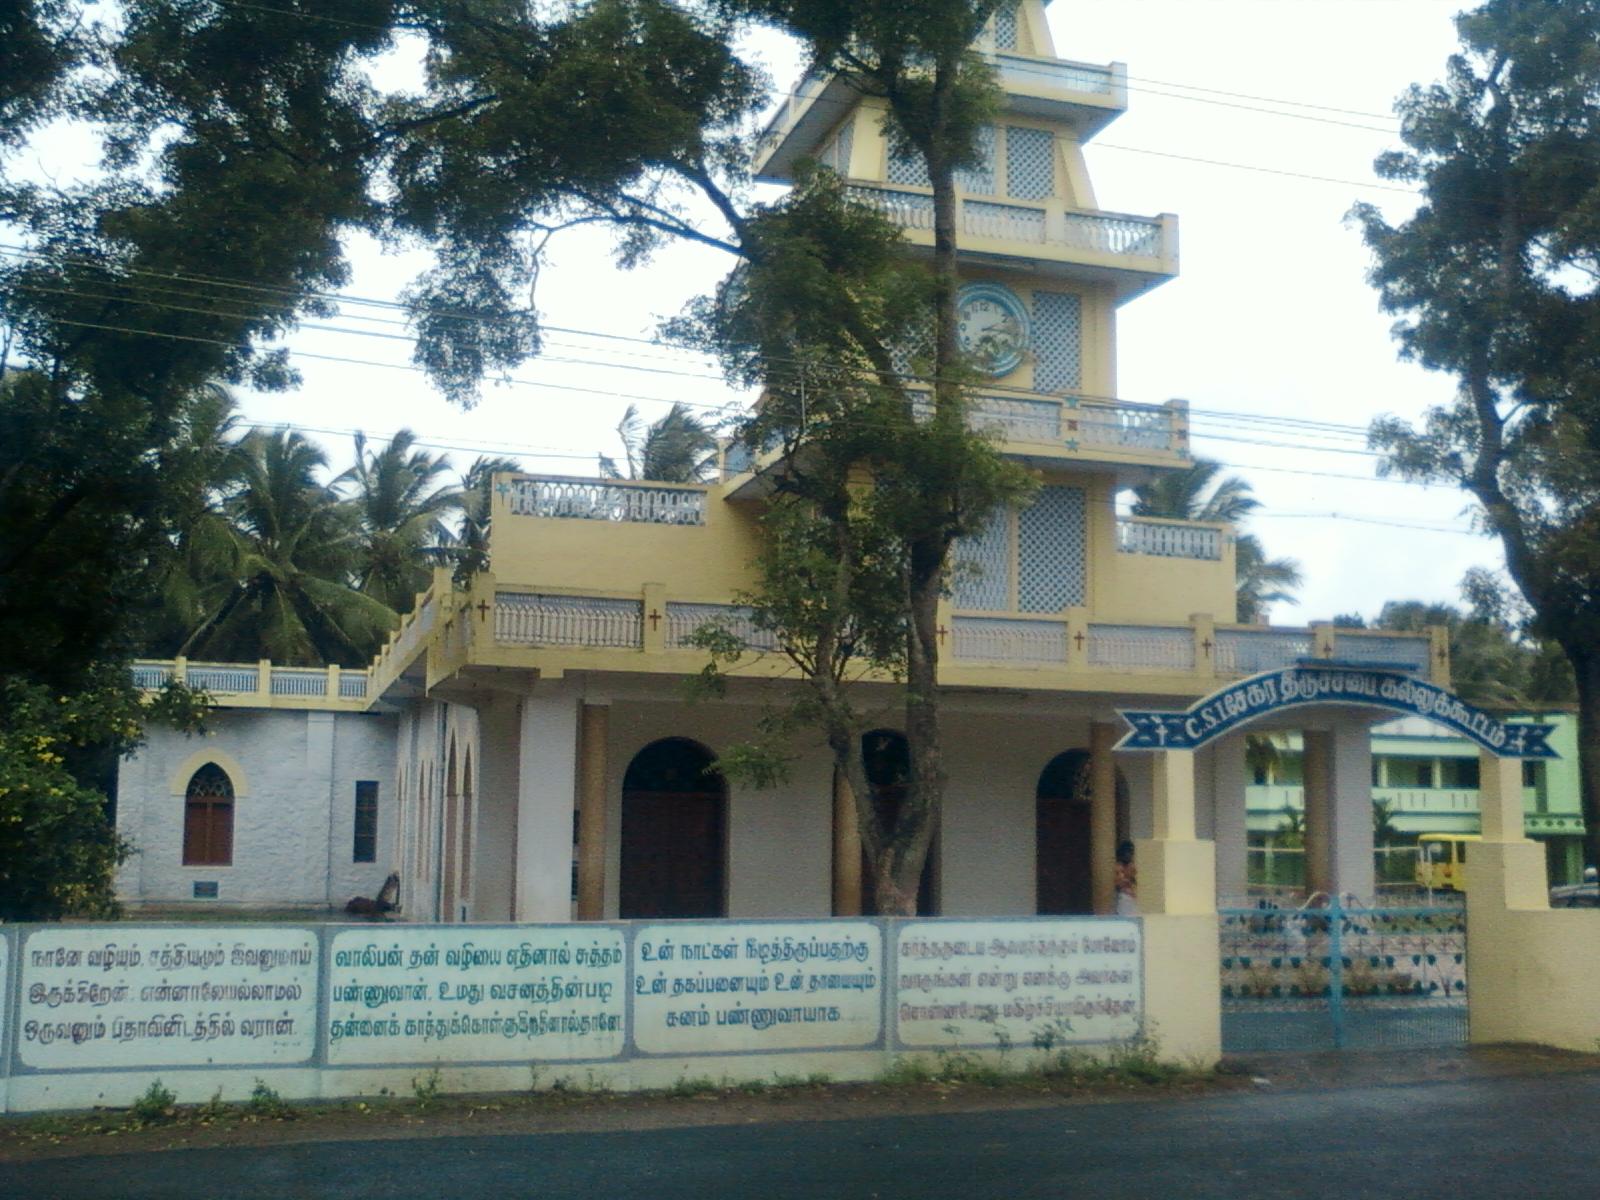 Kallukuttam Chatroom, Tamil Nadu - Free Online India E-Chat